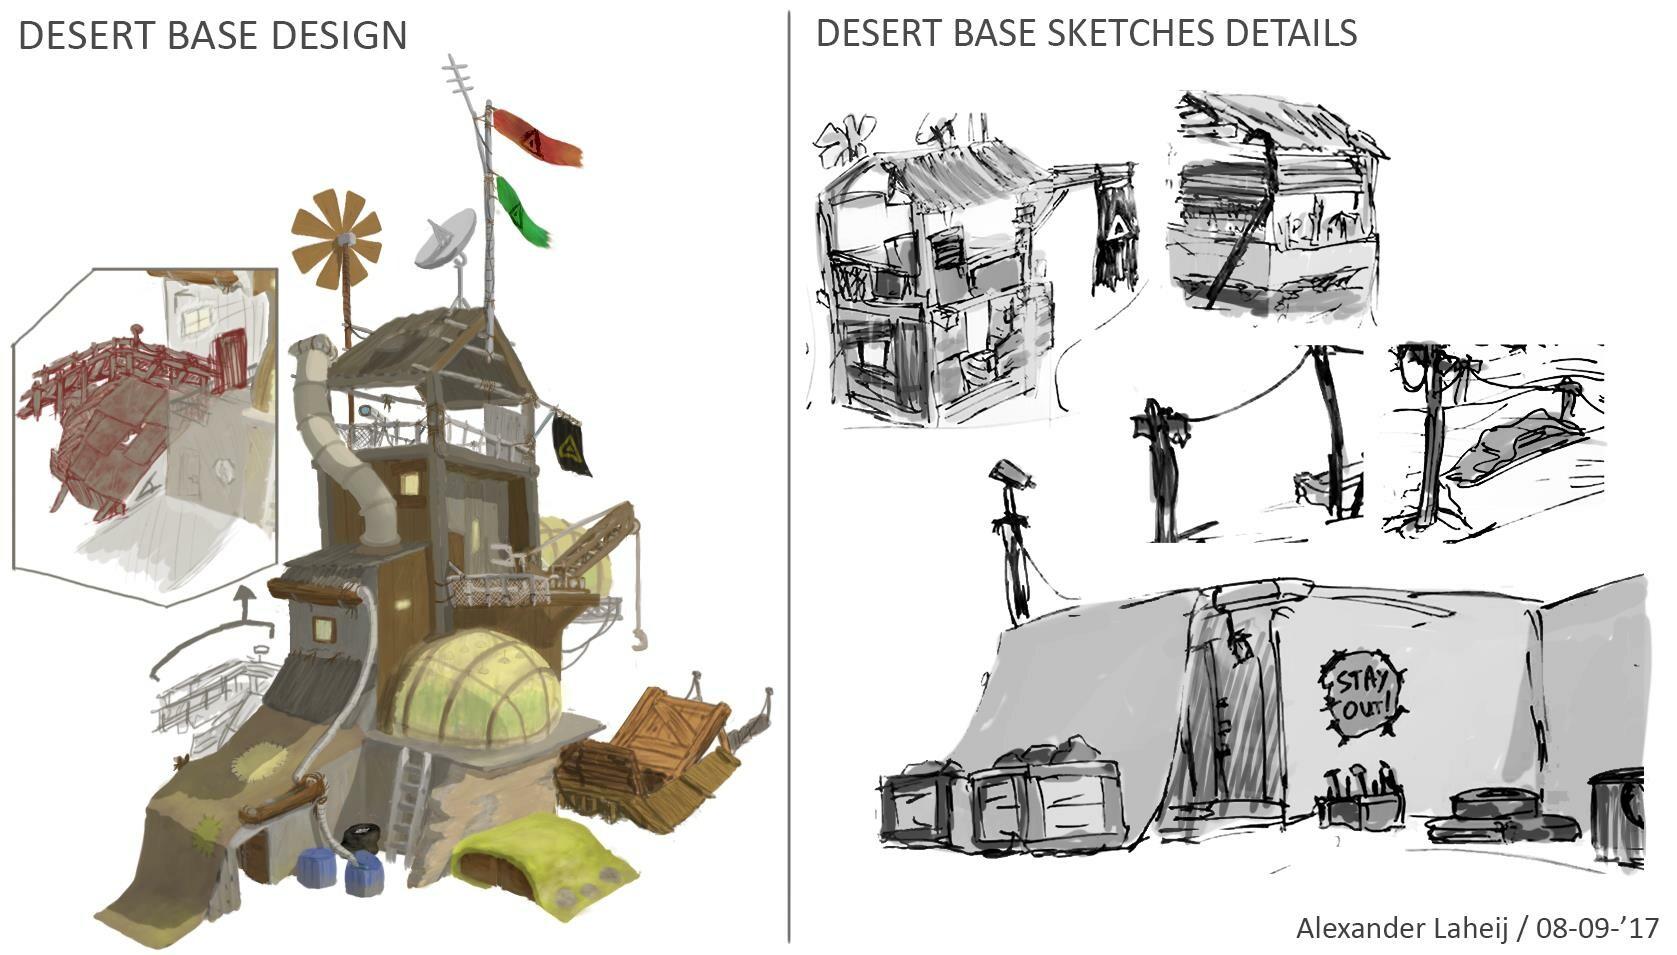 Alexander laheij concept desert base design clean 20170909 002313